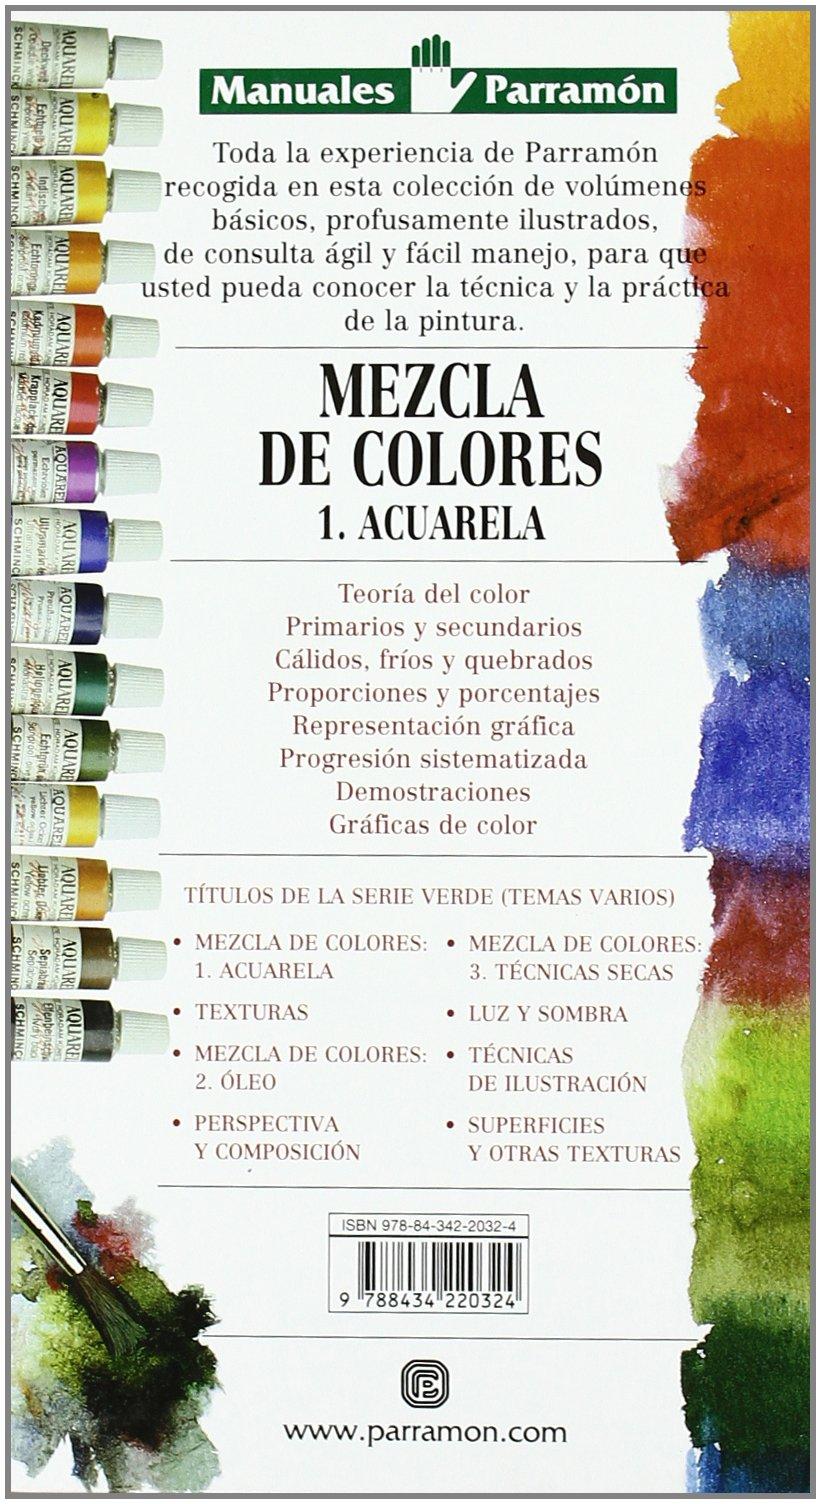 Manuales Parramon - Mezcla de Colores - 1: Jose Maria Parramon:  9788434220324: Books - Amazon.ca